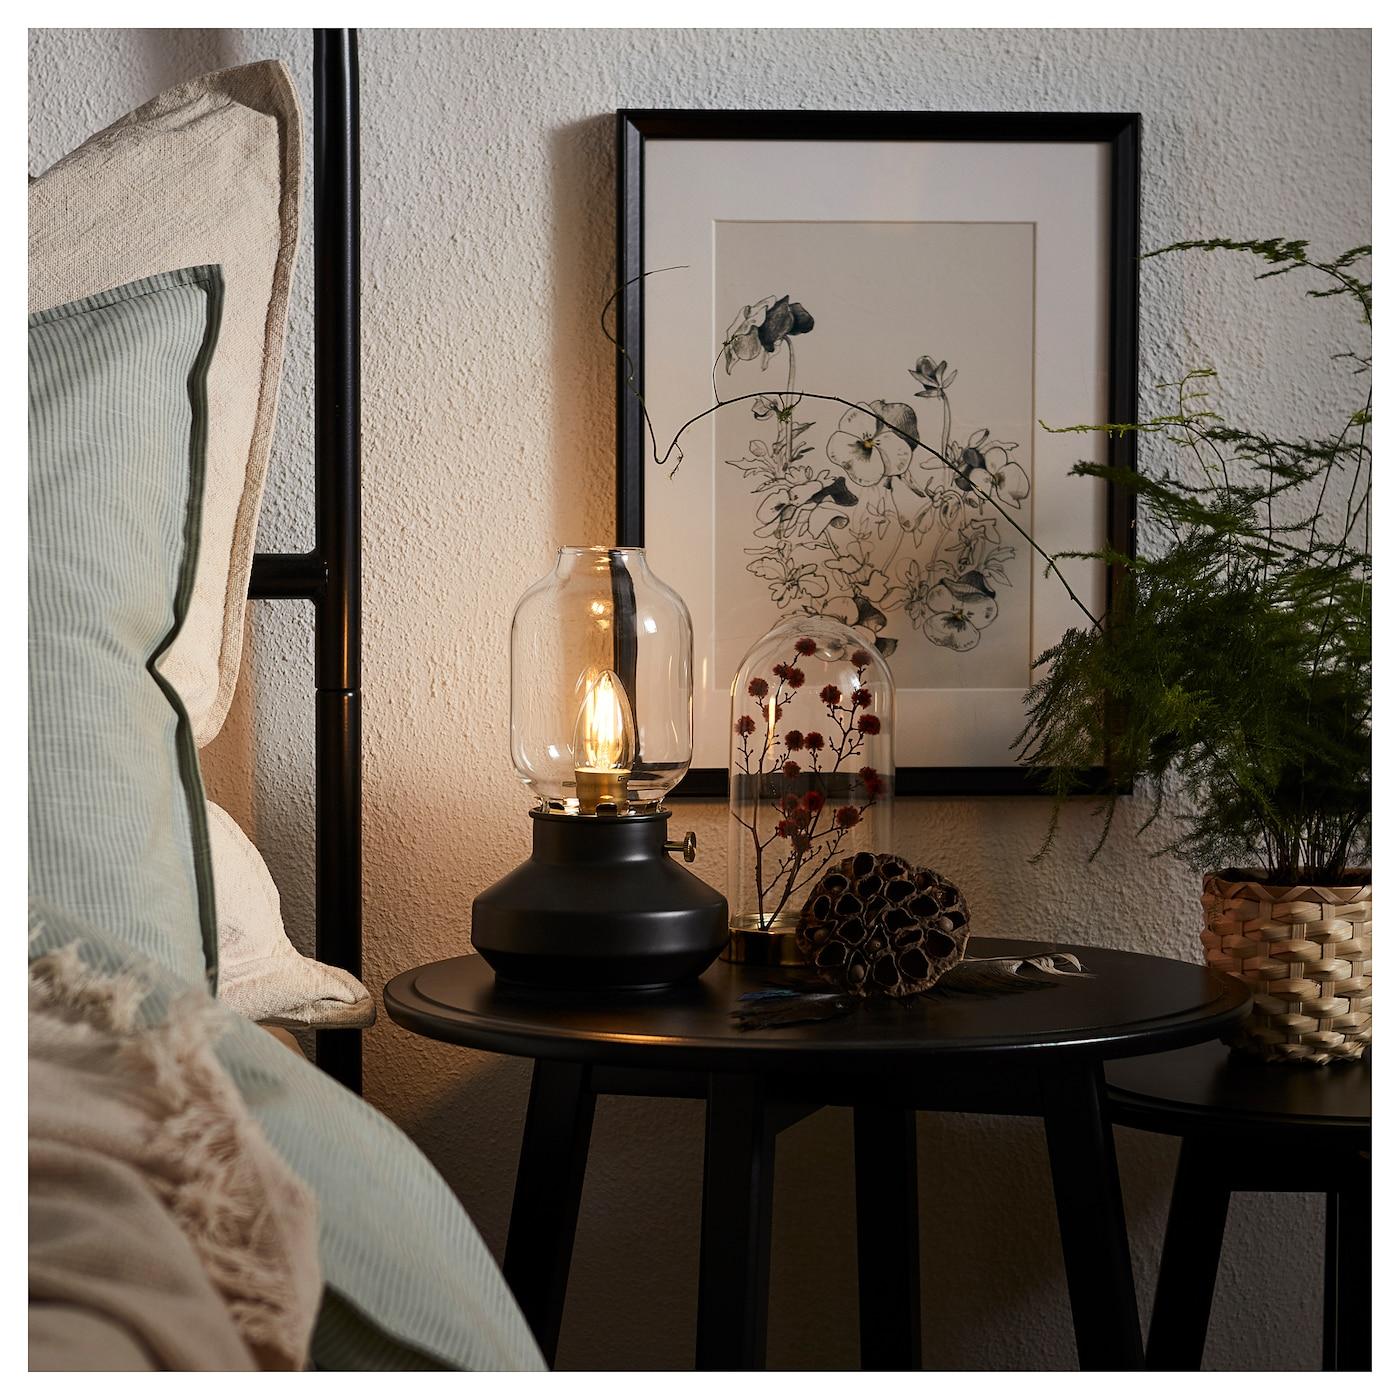 TÄRNABY - Table lamp, anthracite black